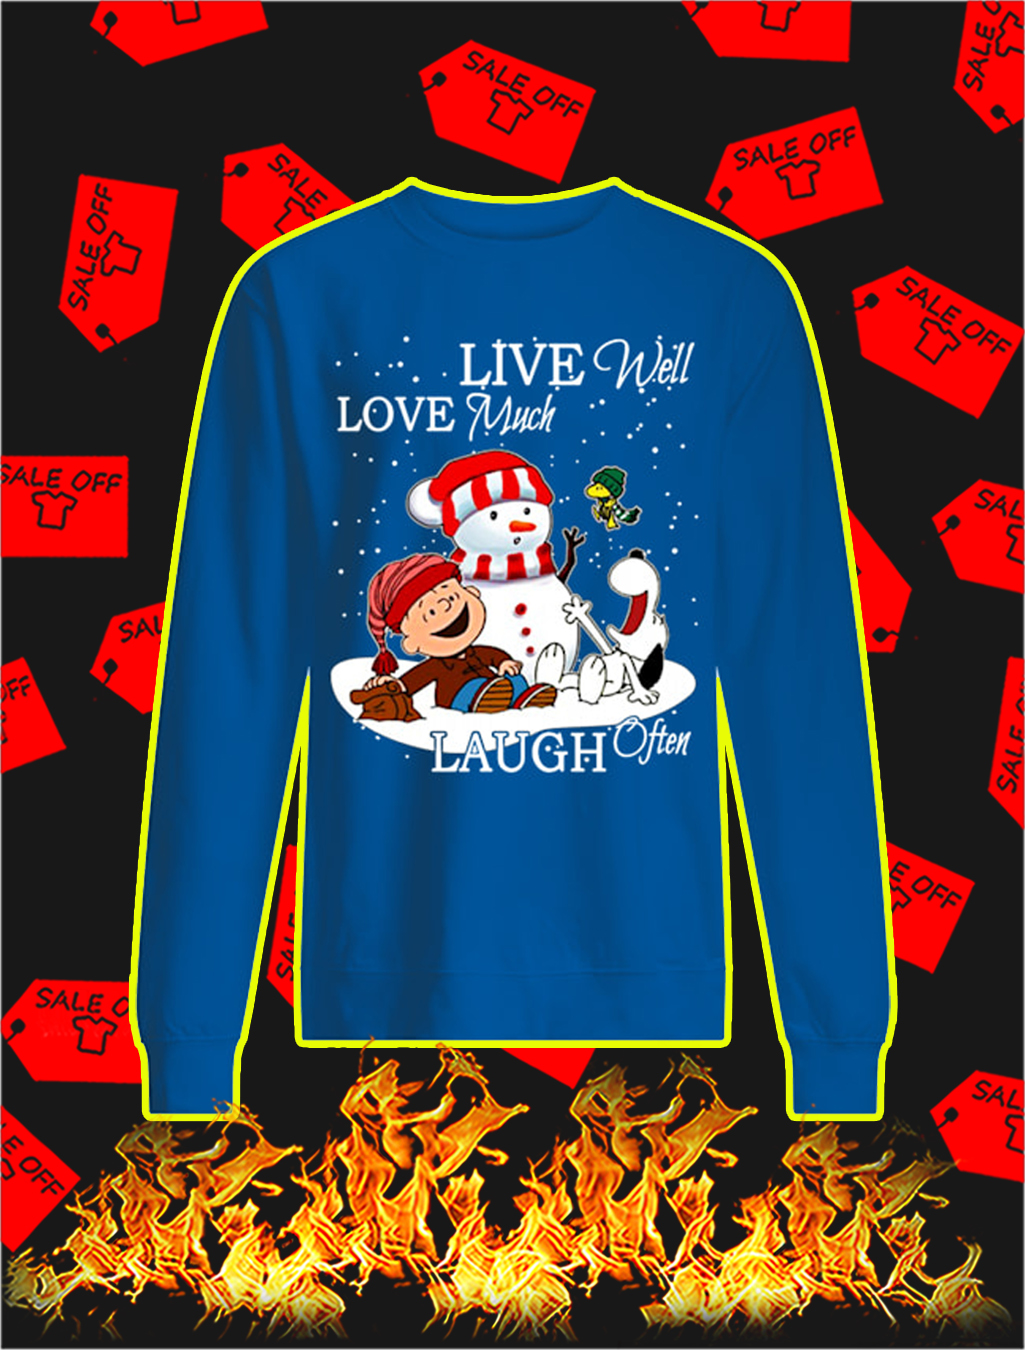 Peanuts Live Well Love Much Laugh Often Christmas sweatshirt